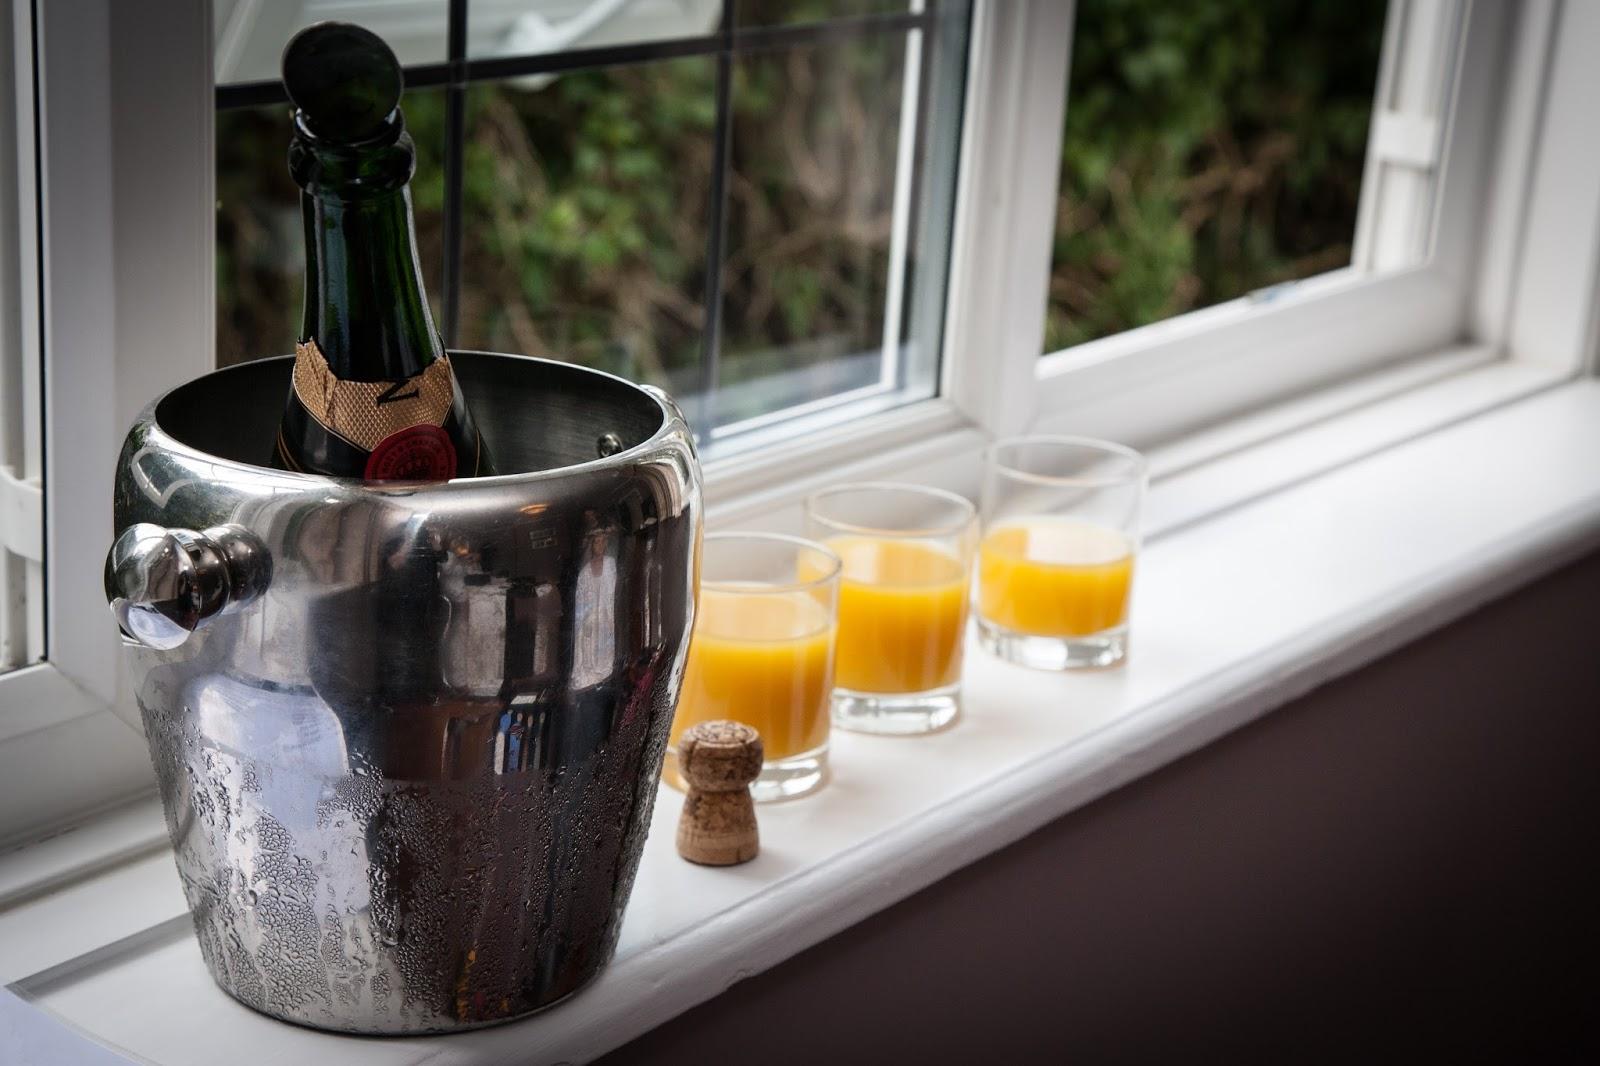 Champagne, bucks fizz, morning prep